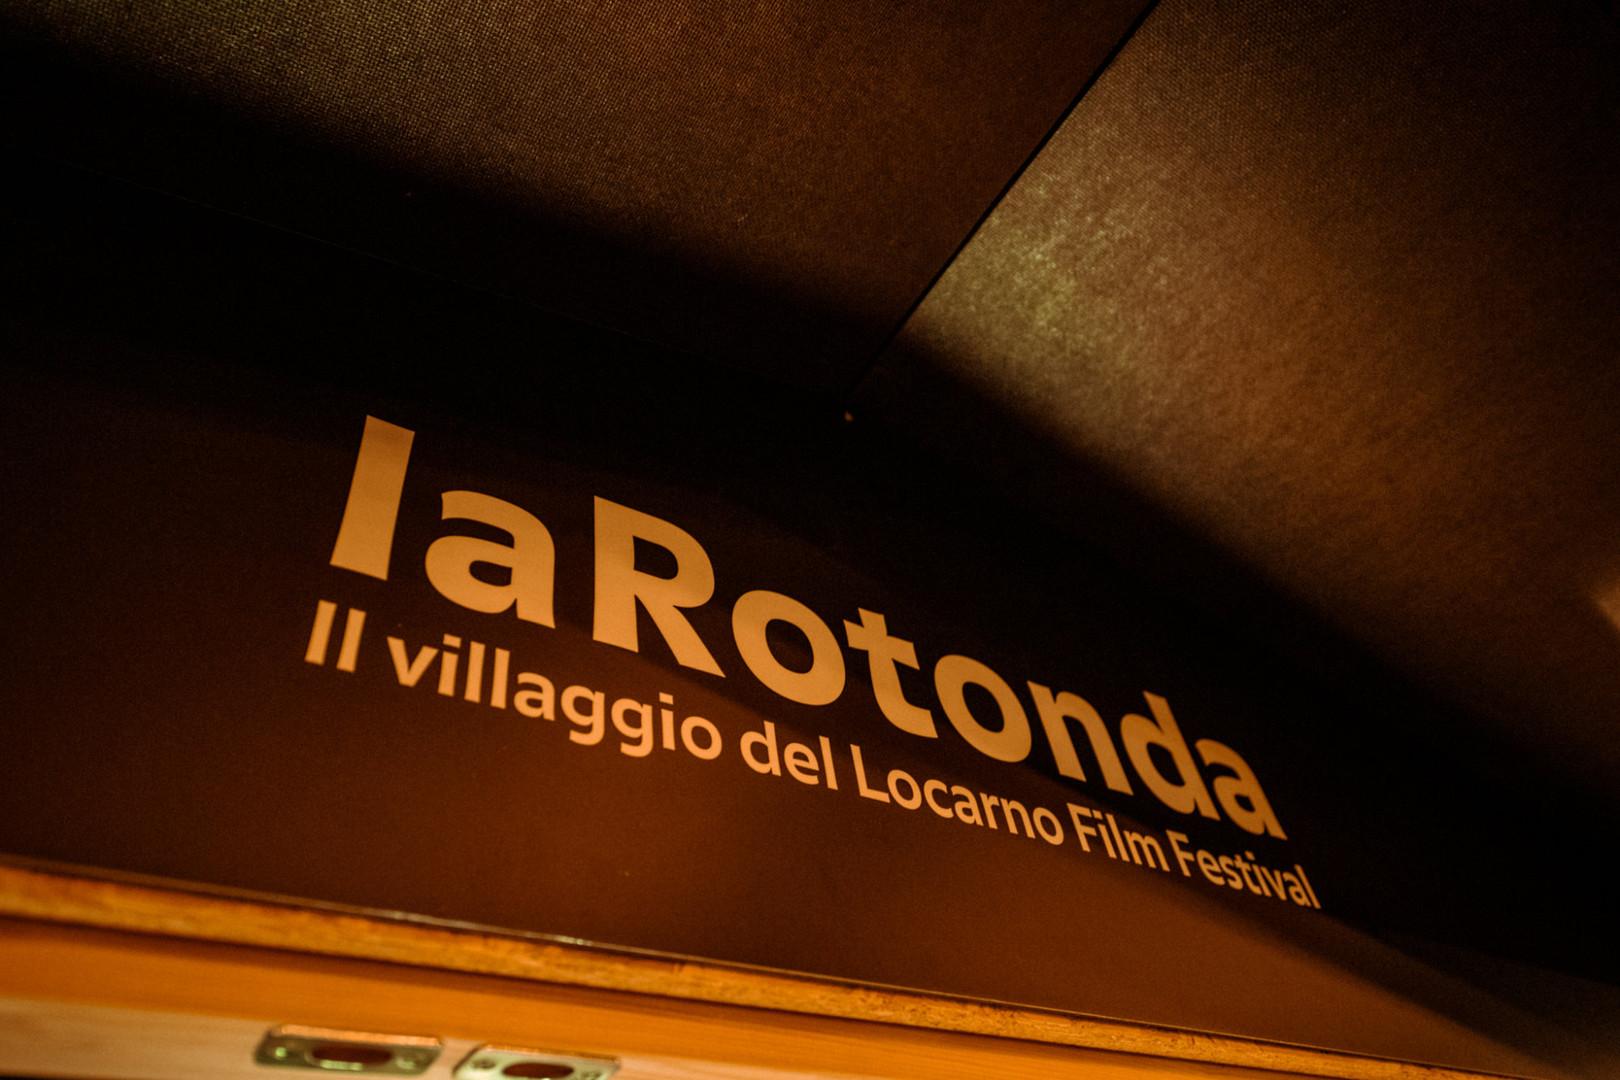 Filmfestival Locardno - laRotonda